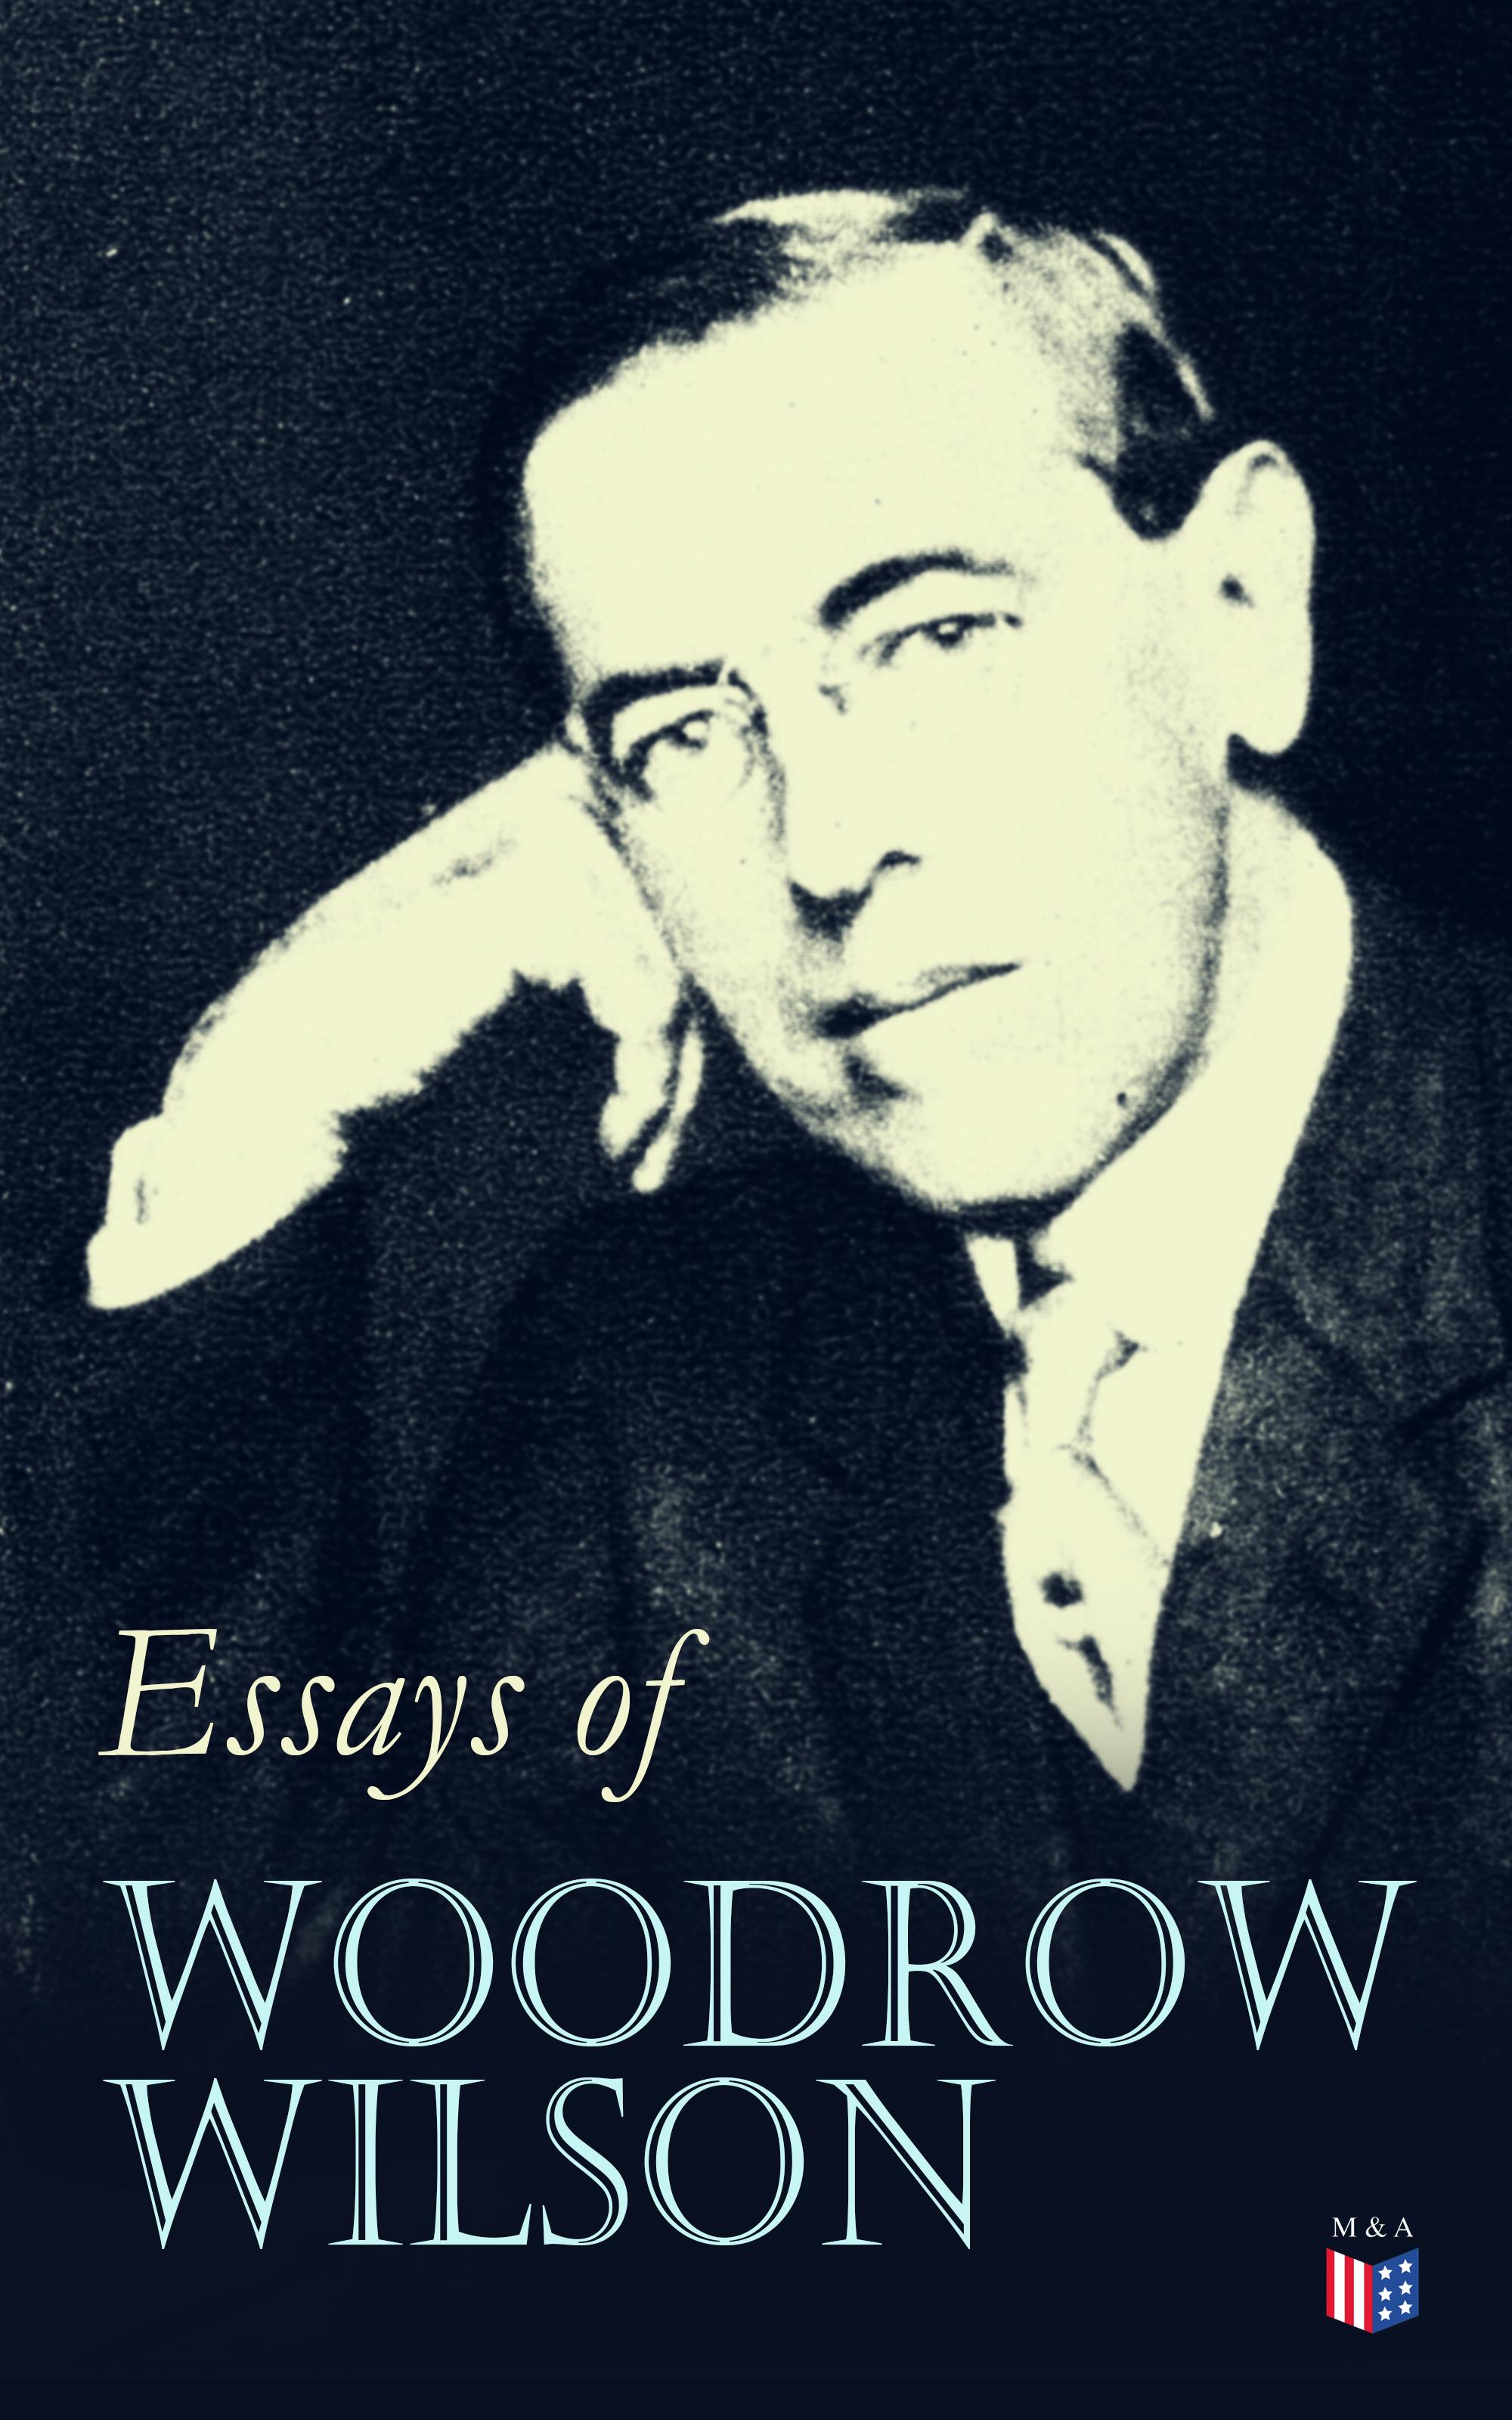 Woodrow Wilson Essays of Woodrow Wilson все цены